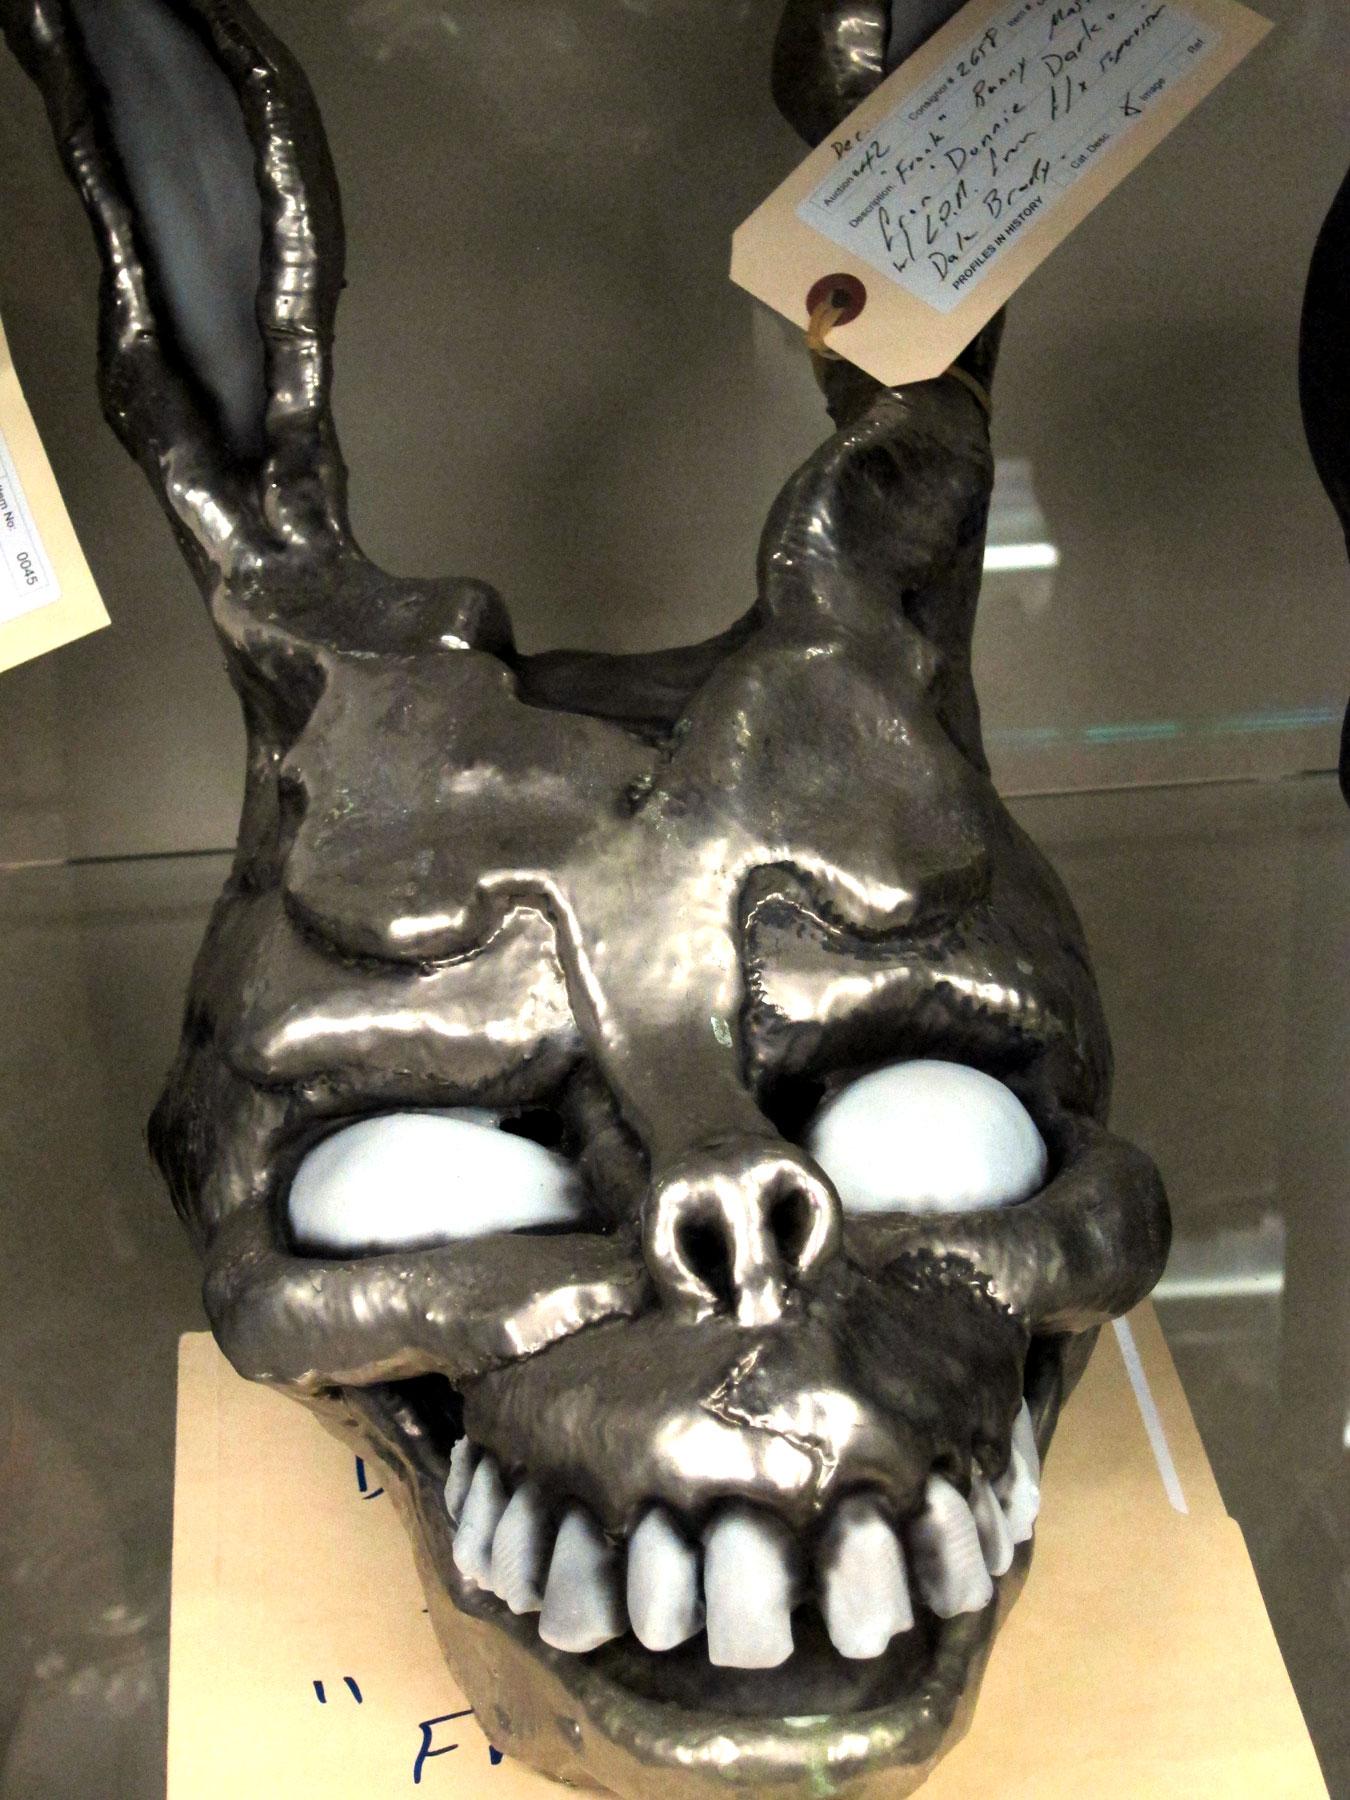 frank-the-rabbit-plated-mask-profiles.jpg